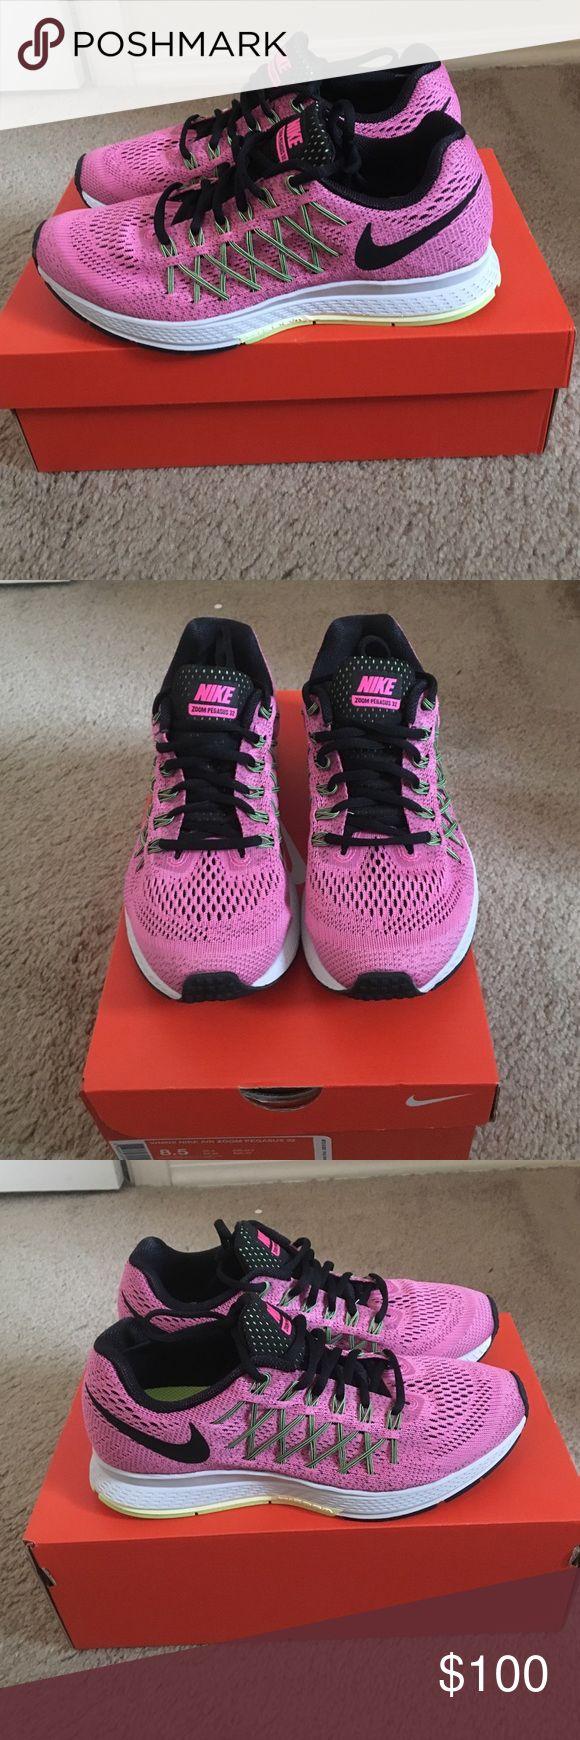 BRAND NEW NEVER WORN Women's Nike Zoom Pegasus 32 These are brand new, never worn, women's pink Nike Zoom Pegasus 32 size 8.5. Brand new with box. Nike Shoes Sneakers